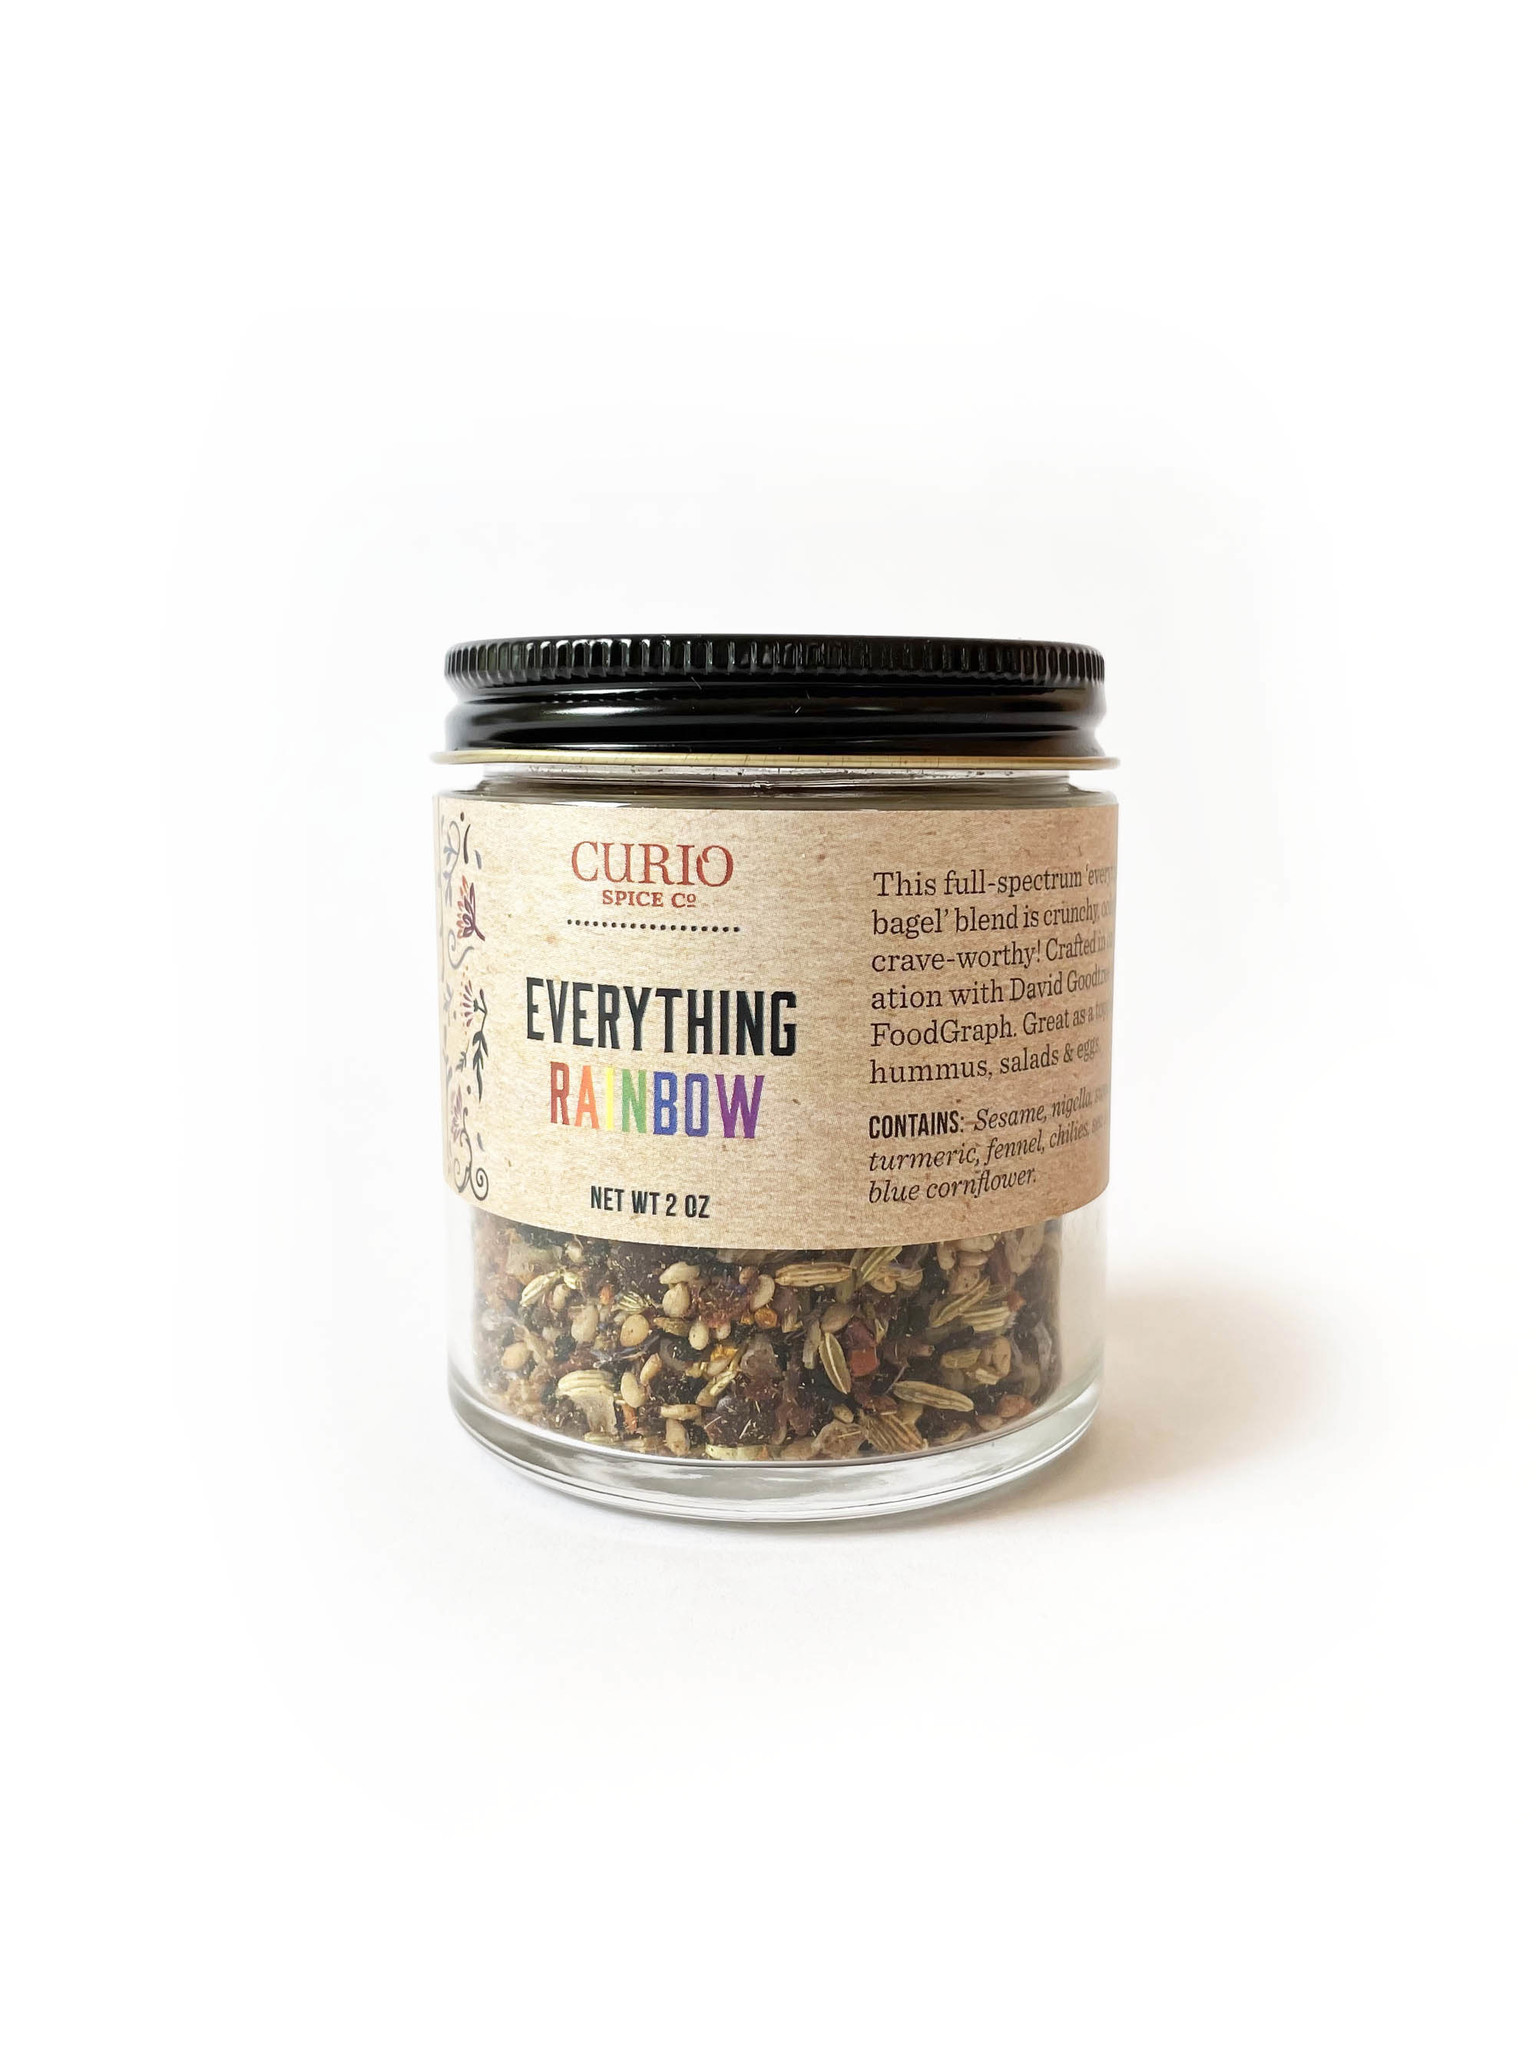 Curio Spice Co. Everything Rainbow Spice Mix, 2 oz.-1